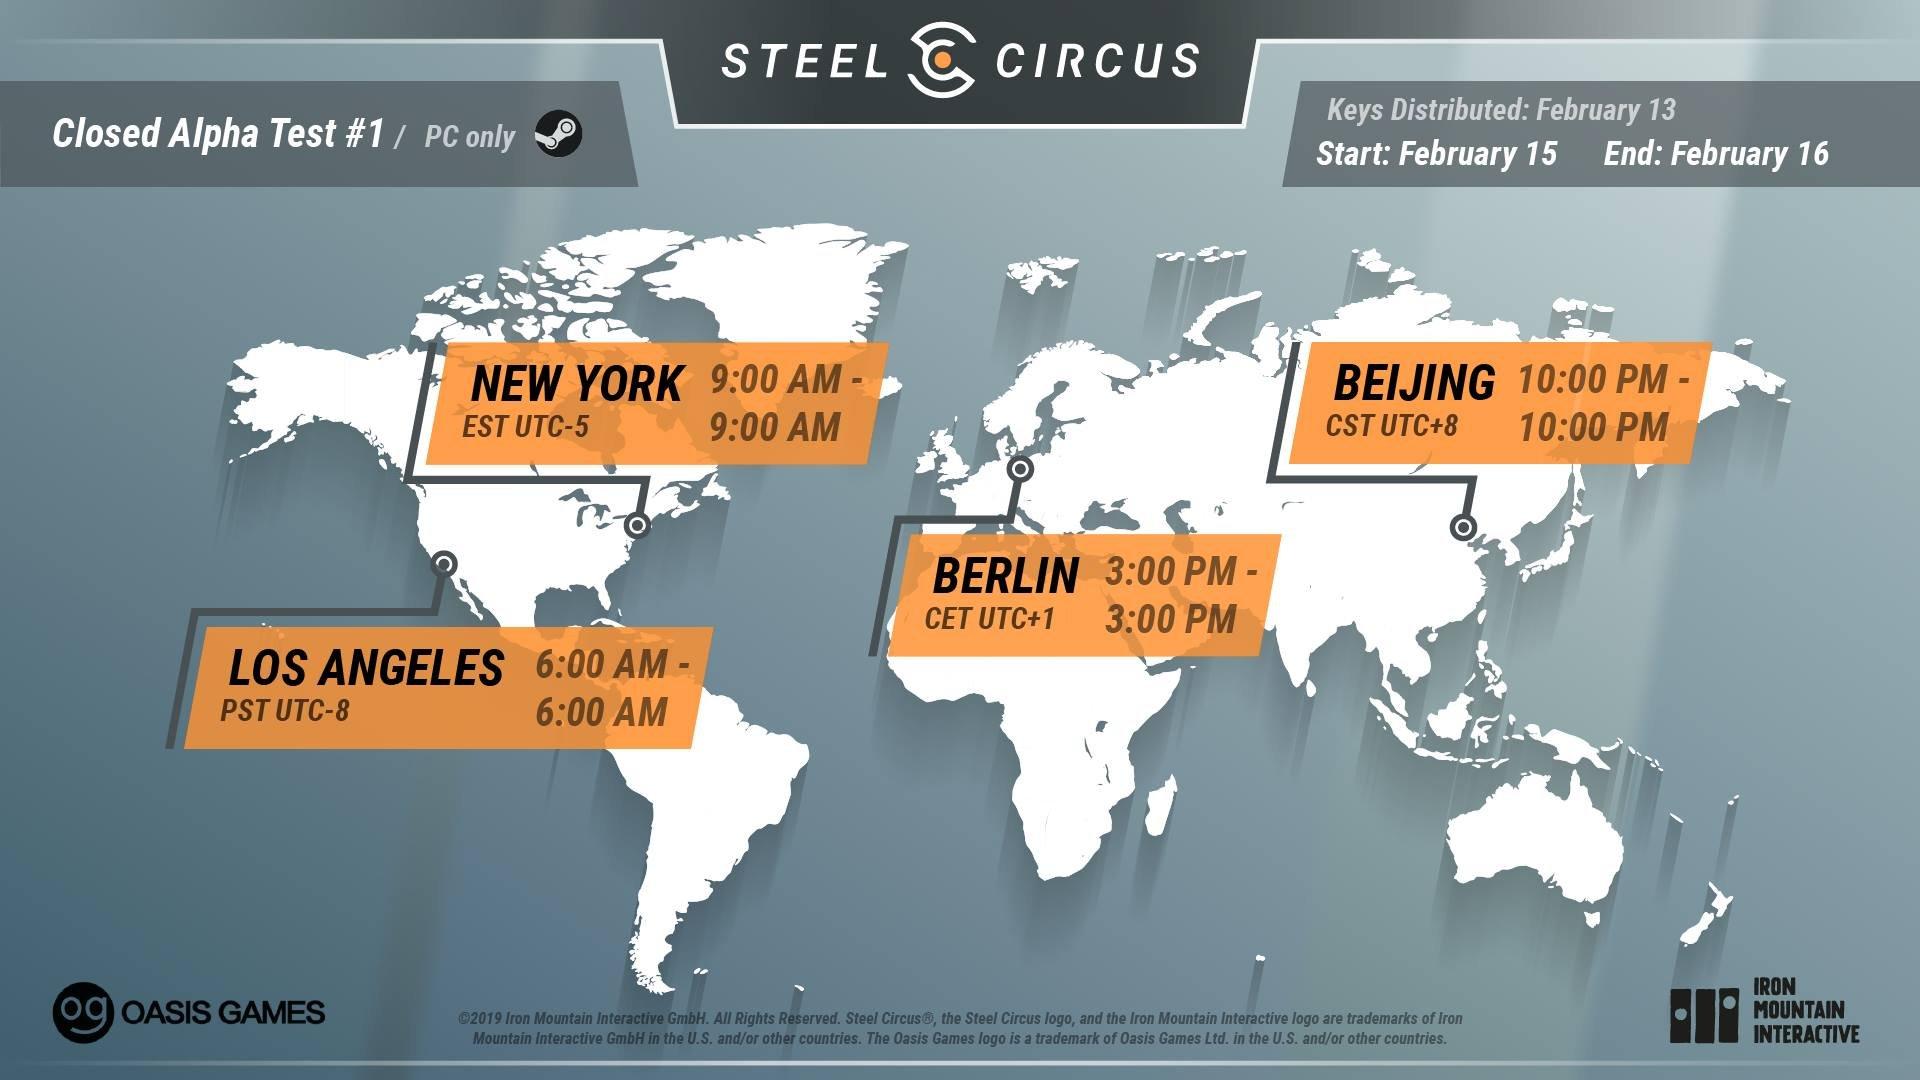 Steel Circus alpha test